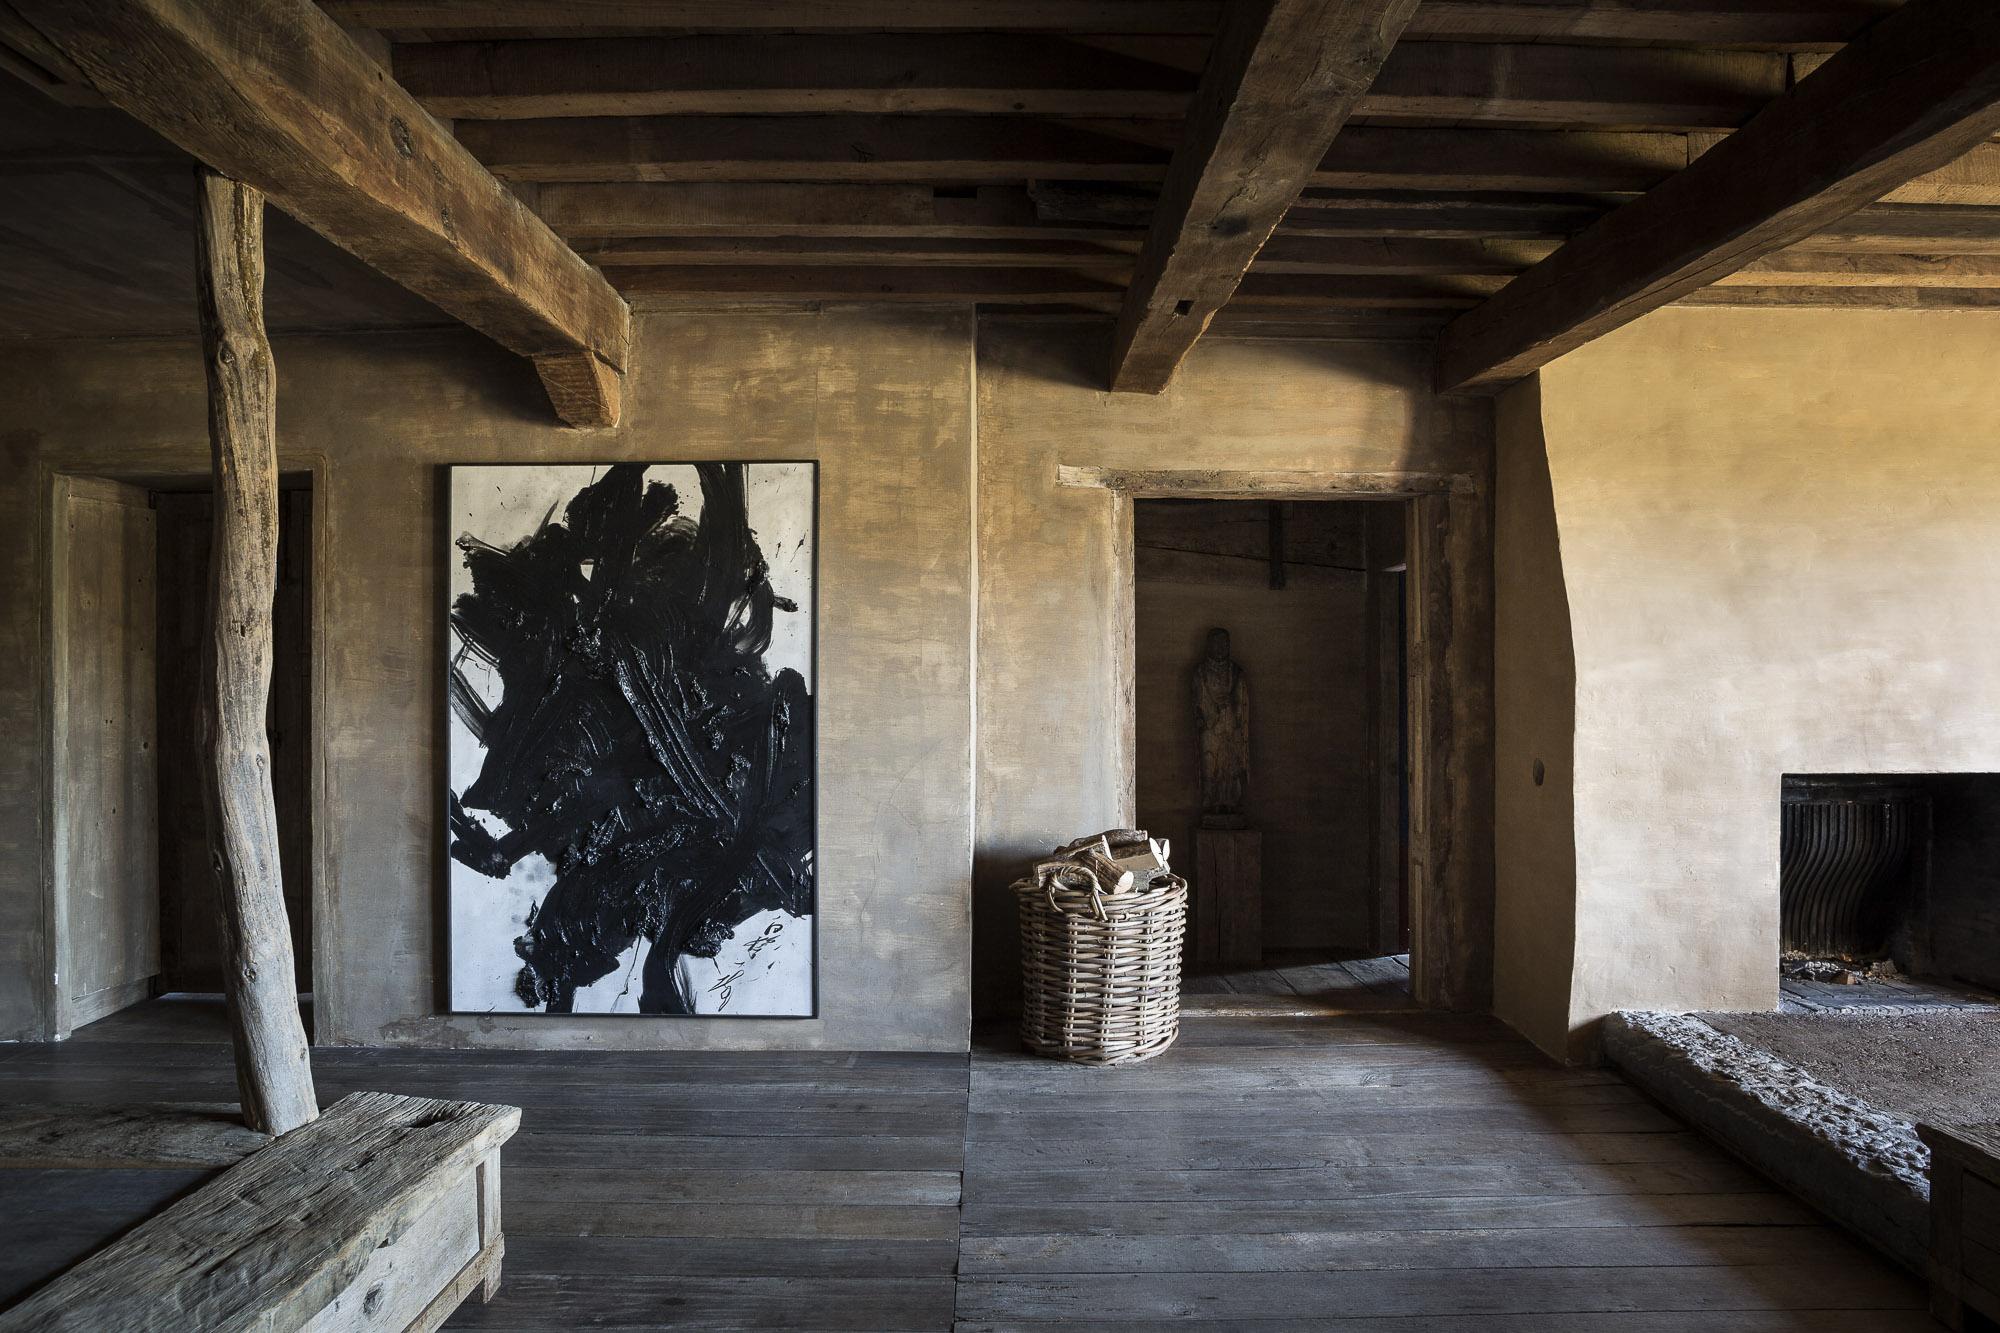 art-dealer-axel-vervoordt-belgian-estate-by-frederik-vercruysse-3